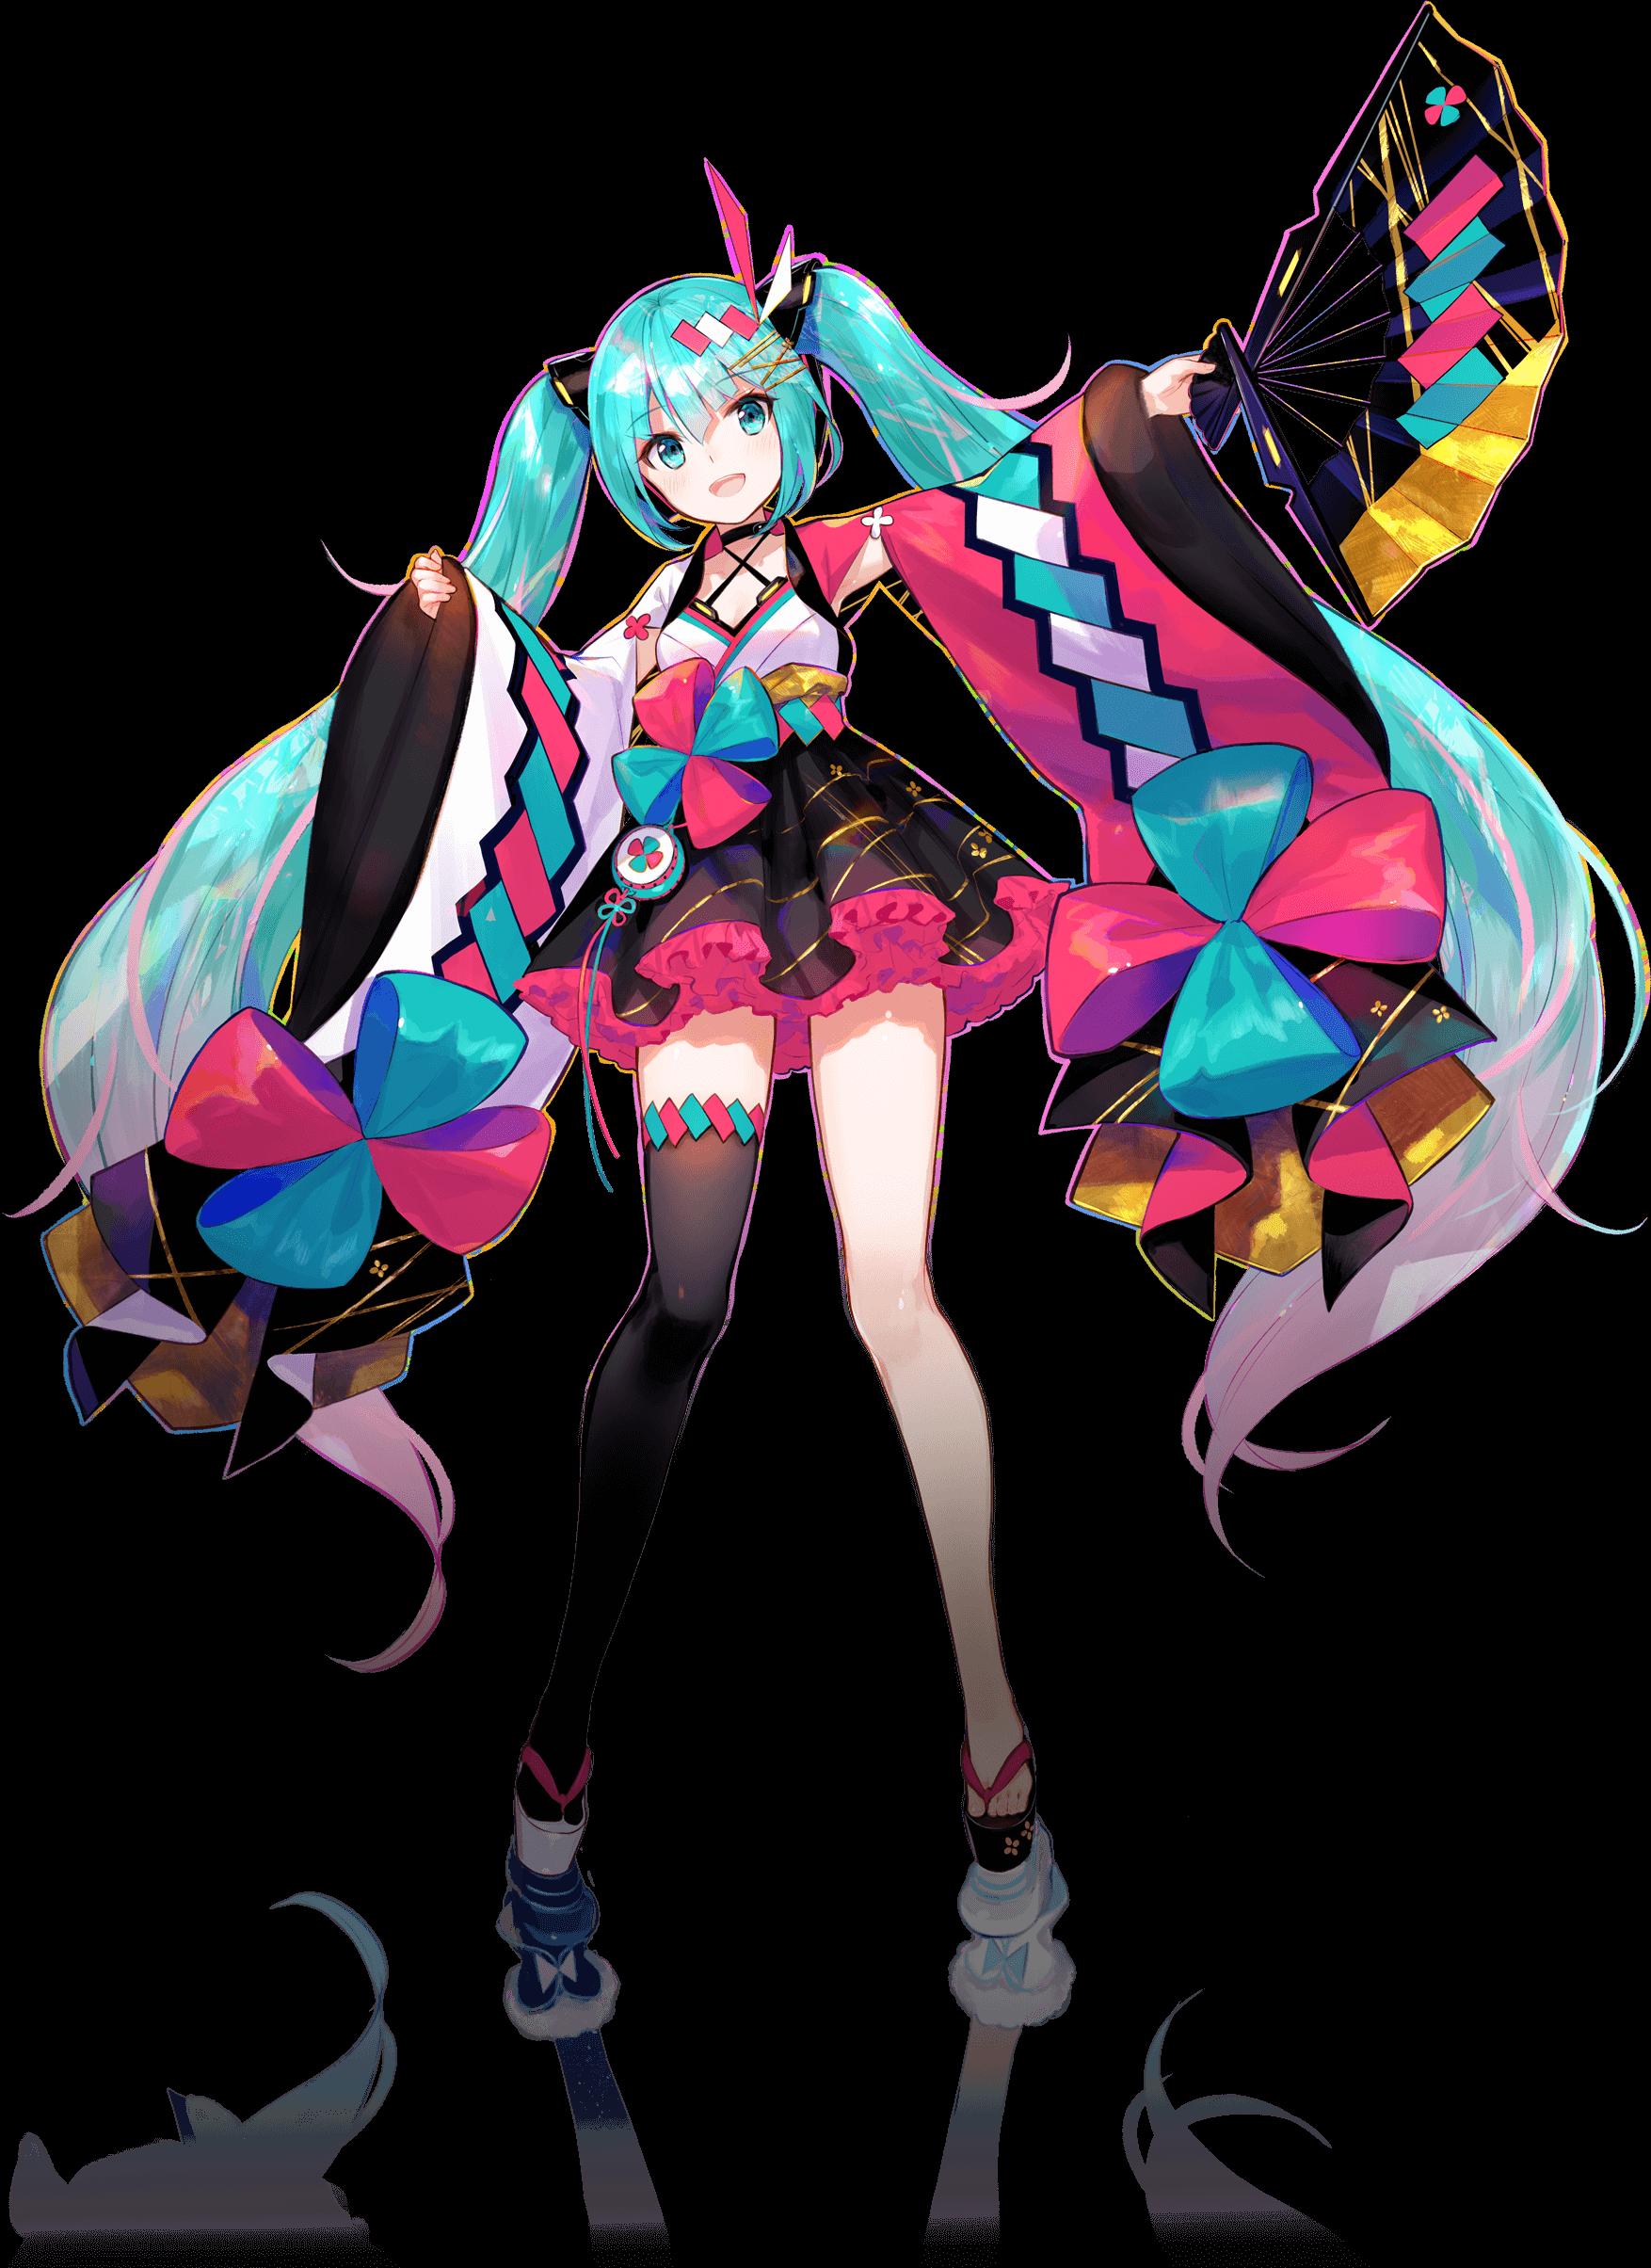 Hatsune Miku Magical Mirai 2020